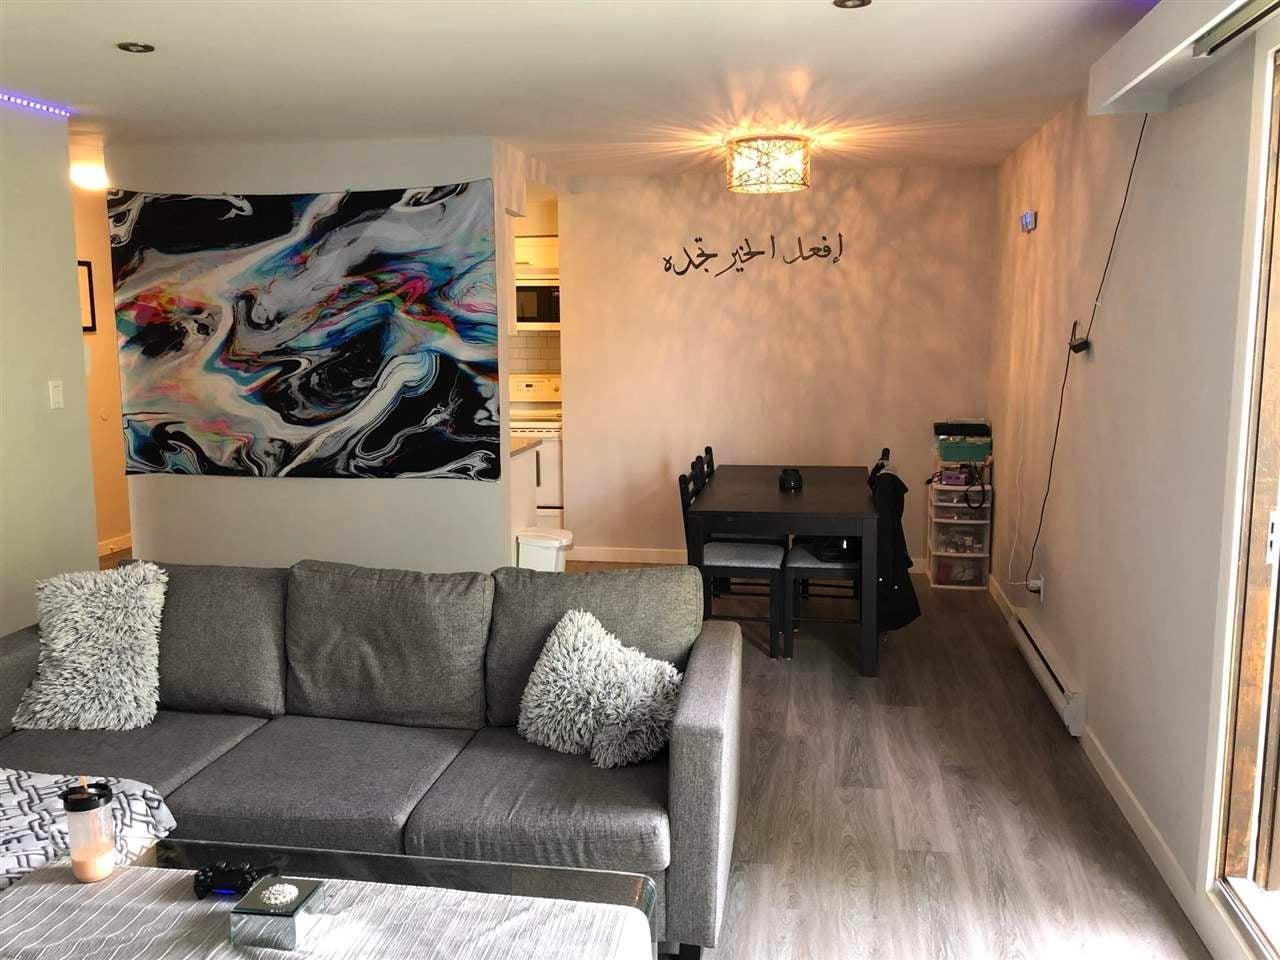 304 15238 100 AVENUE - Guildford Apartment/Condo for sale, 1 Bedroom (R2576105) - #3